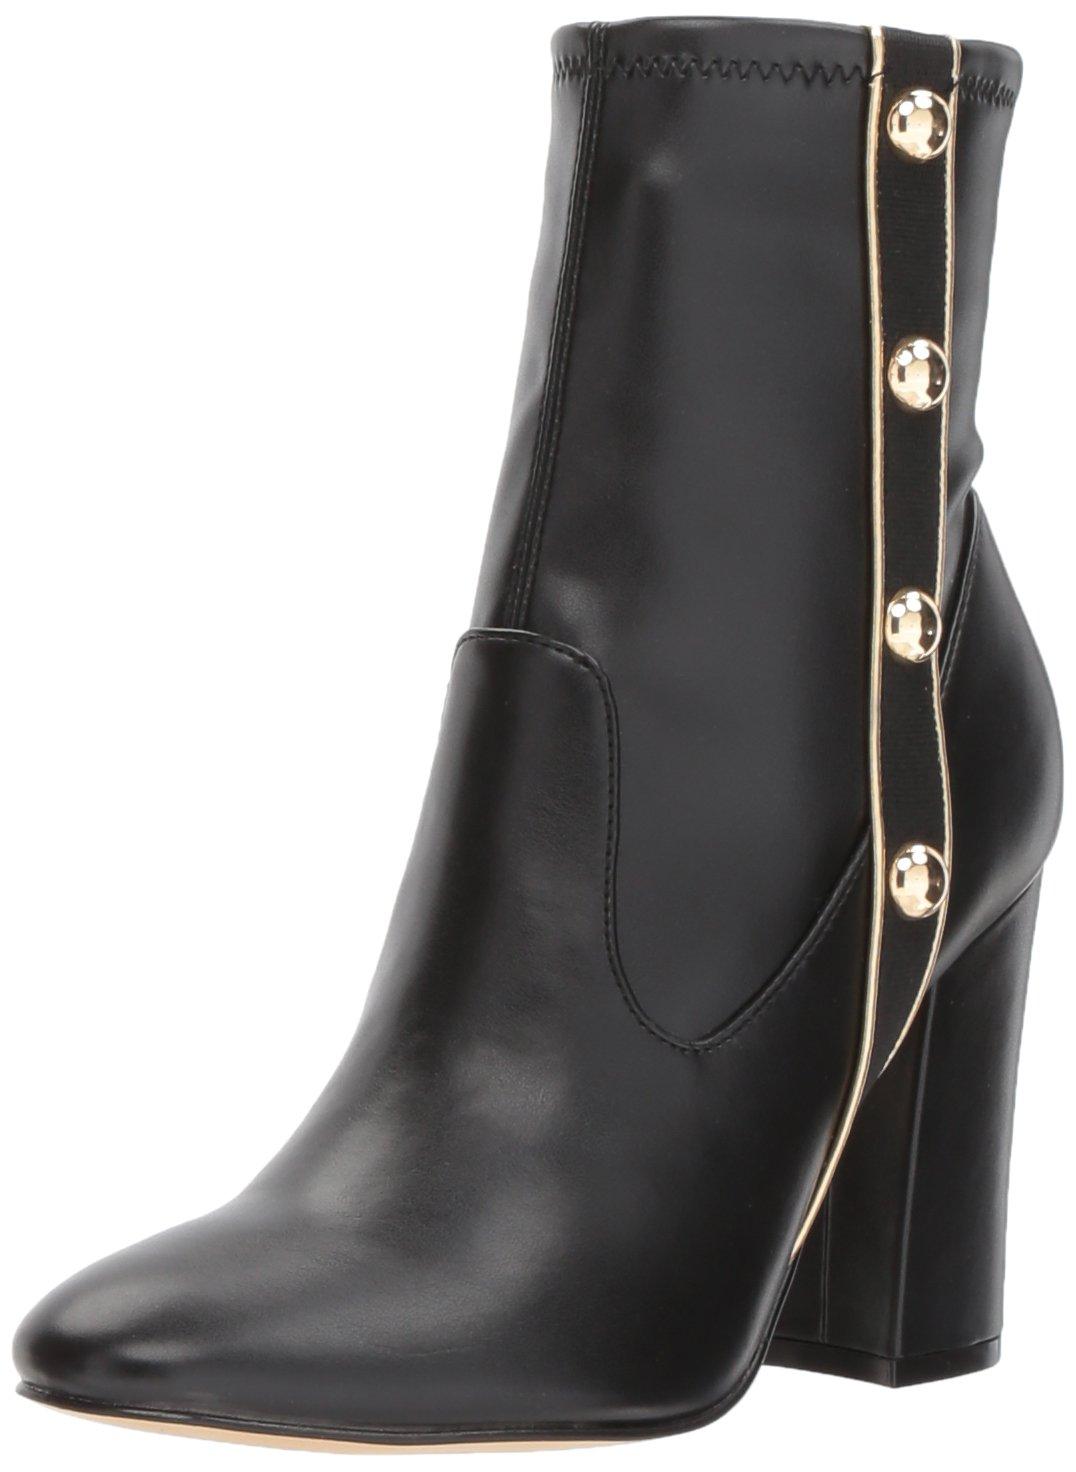 Marc Fisher Women's Abela Fashion Boot B072C3FW9D 8 B(M) US|Black